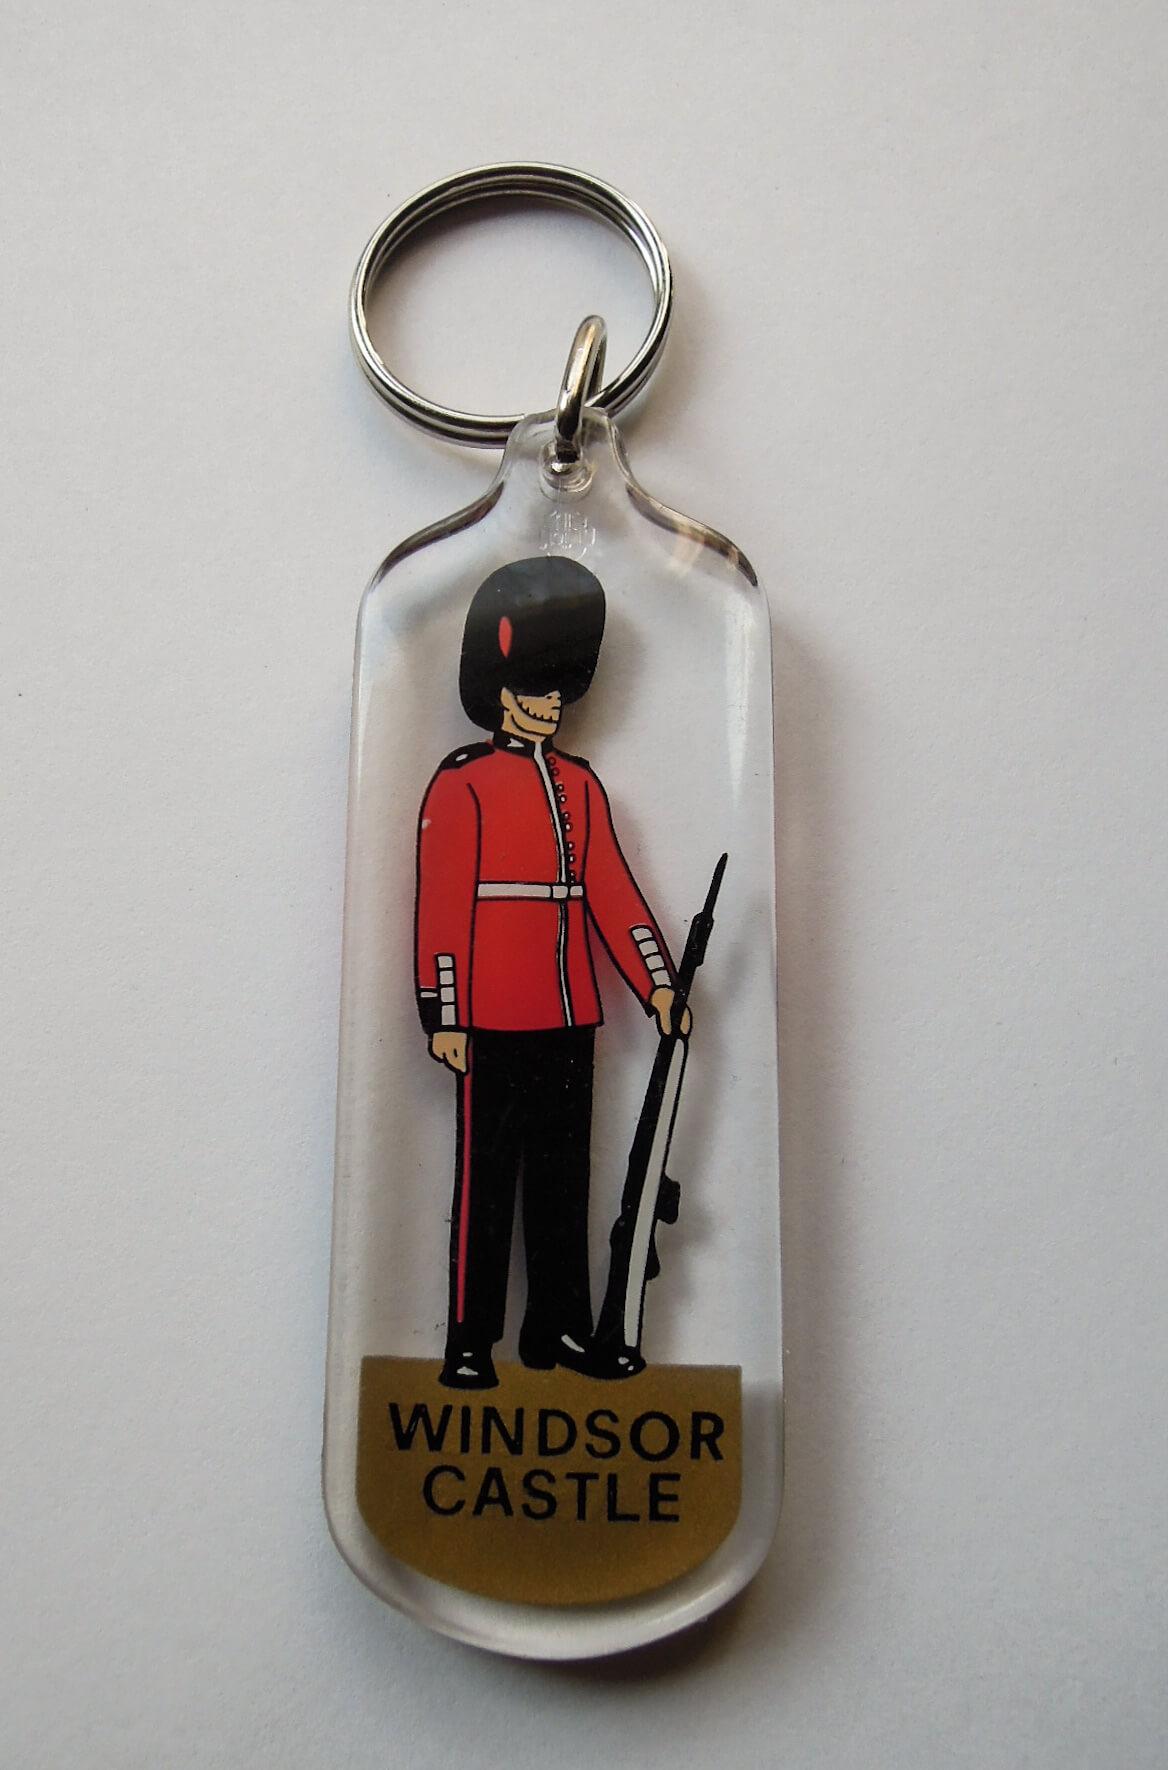 Windsor Castle kulcstartó